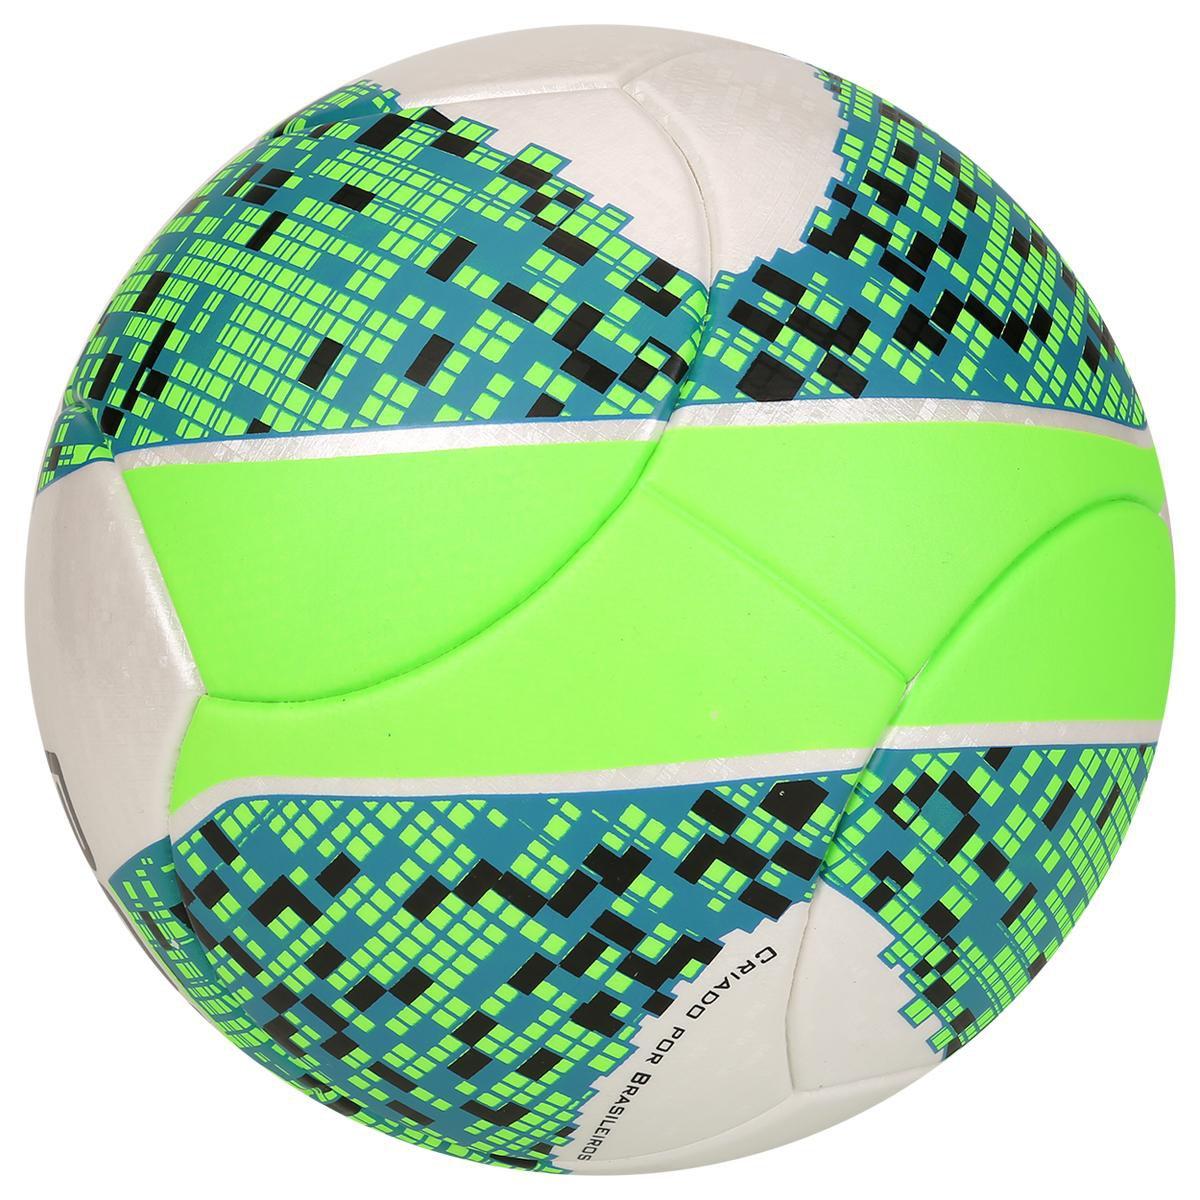 6a37655c08 Bola Futsal Penalty Digital 500 Ultra Fusion VI - Compre Agora ...